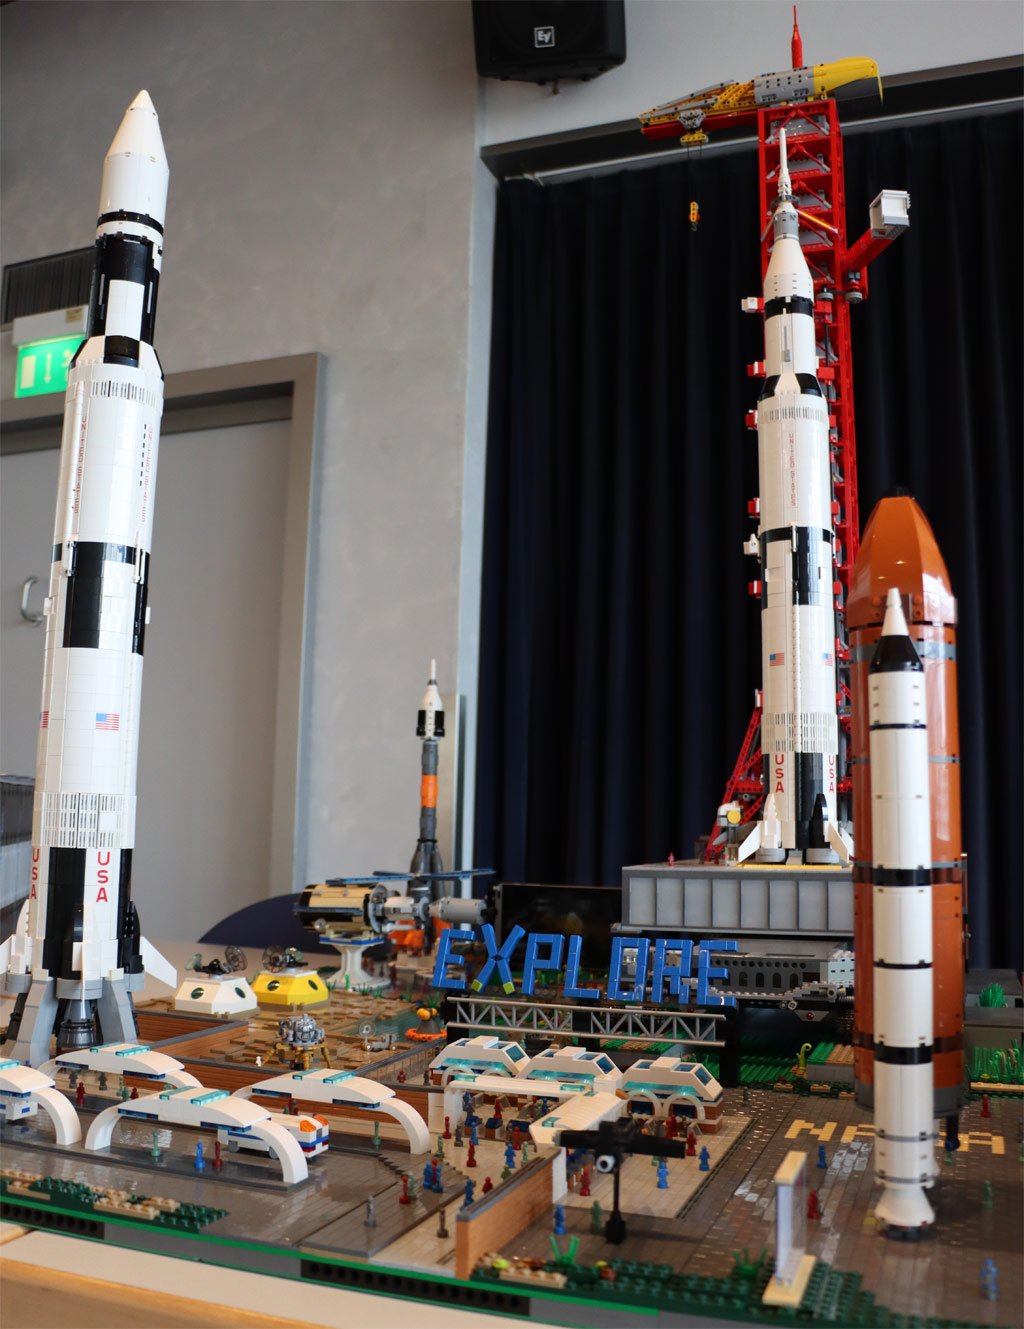 lego-projekt-jfk-nasa-space-center-juergen-kropp-2019-zusammengebaut-andres-lehmann zusammengebaut.com